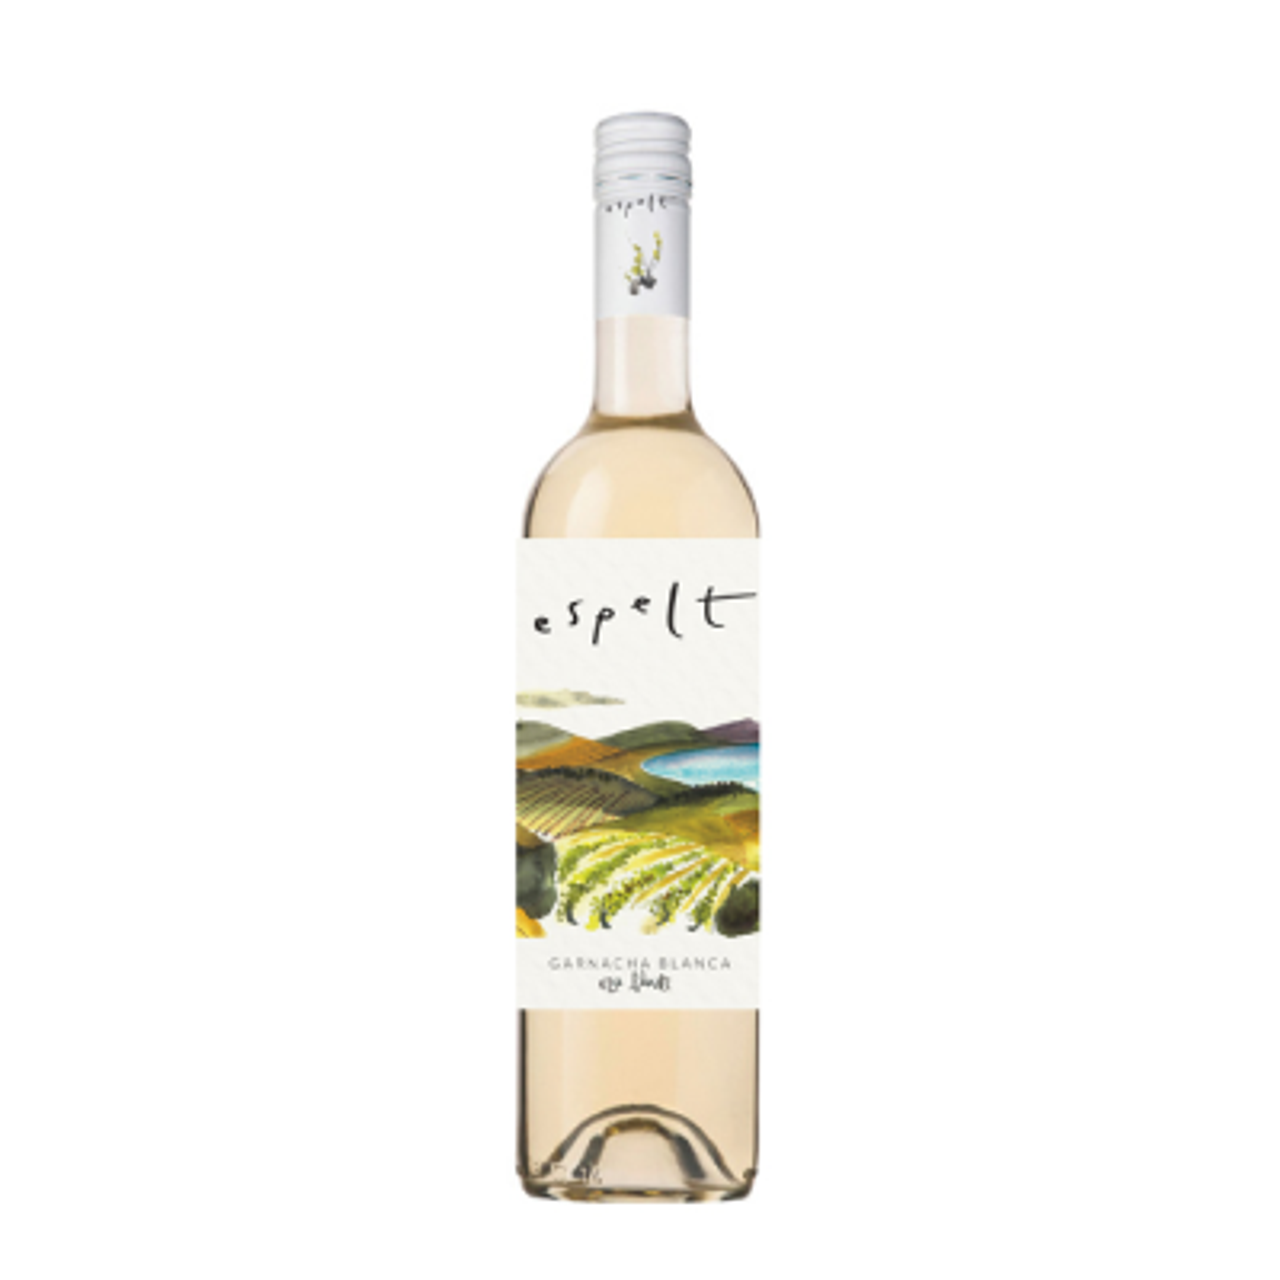 Catalonian White Wine